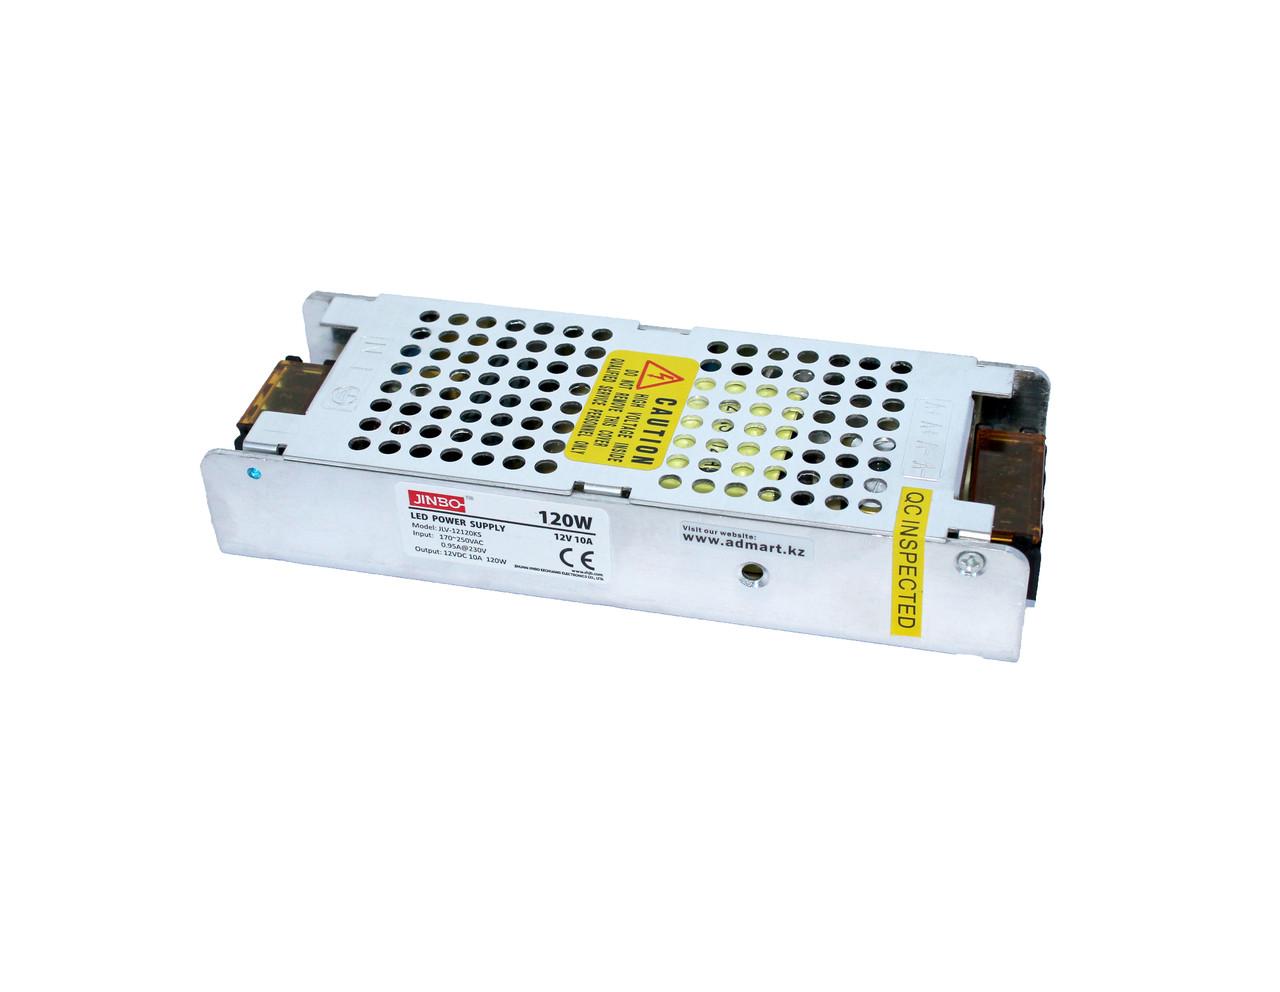 Трансформатор 120W COMPACT NEW LED